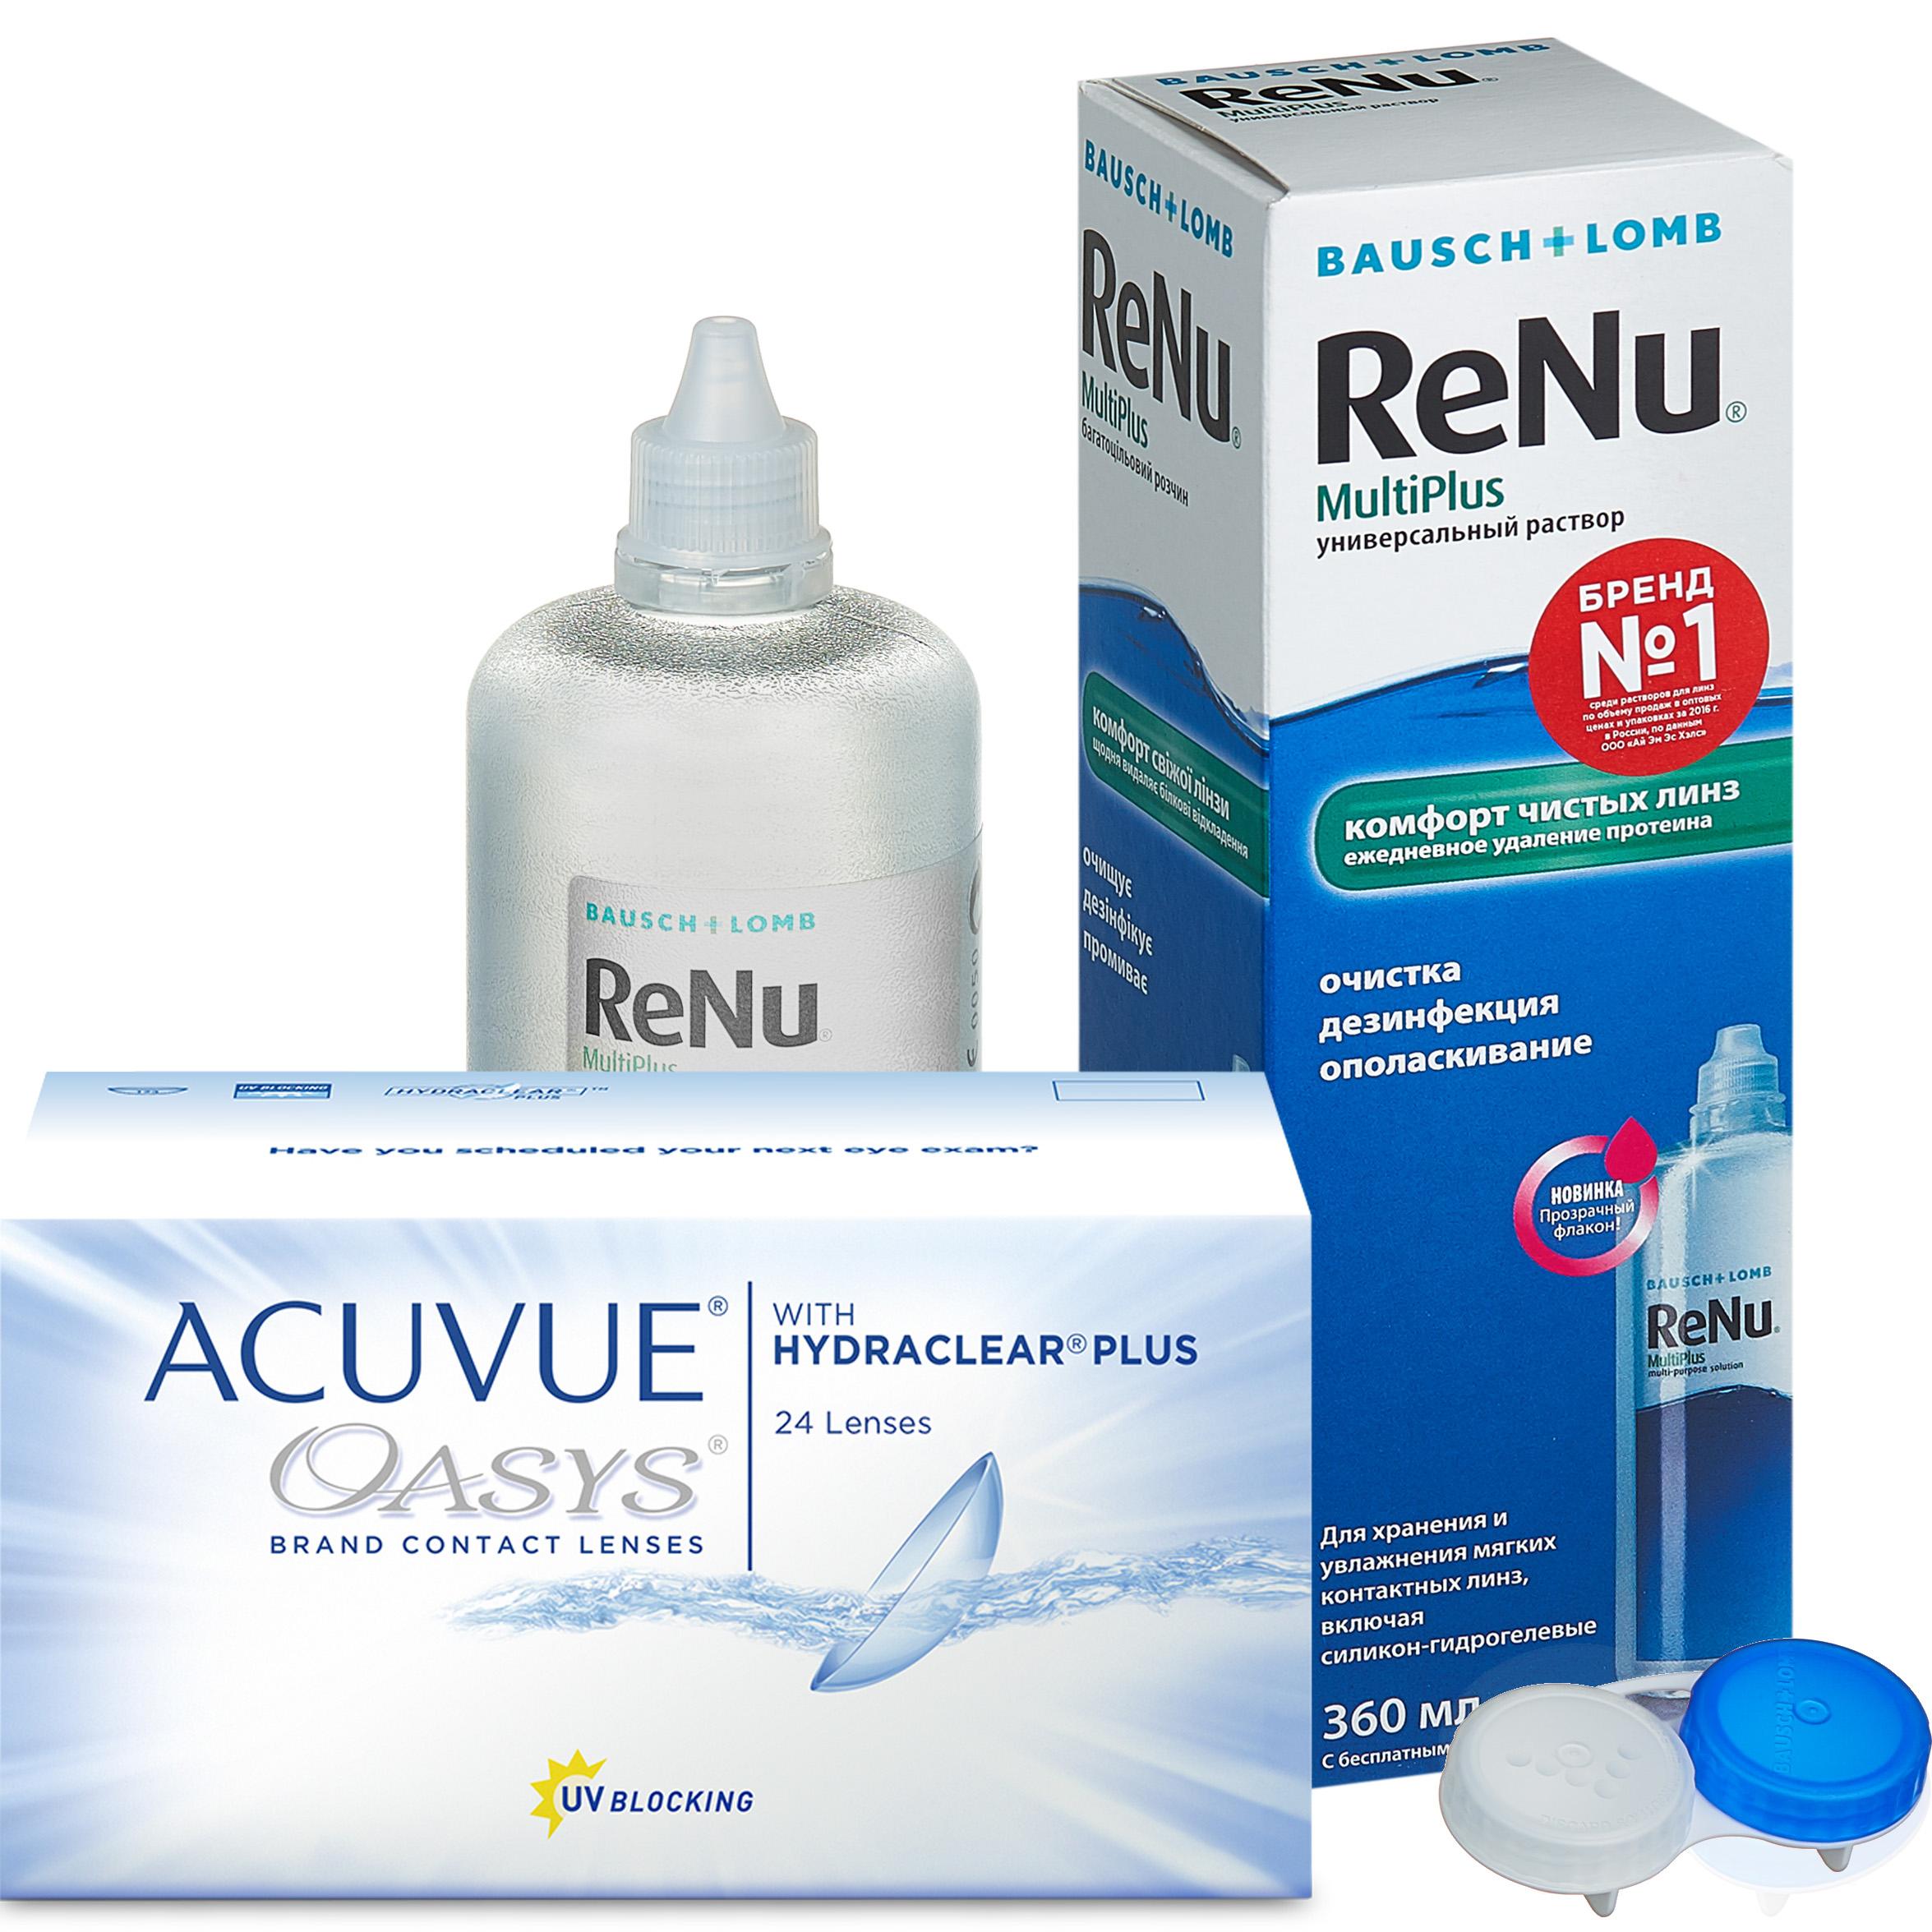 Купить Oasys with Hydraclear Plus 24 линзы + ReNu MultiPlus, Линзы Acuvue Oasys with Hydraclear Plus 24 линзы R 8.4 -0, 50 + ReNu Multi Plus 360 мл